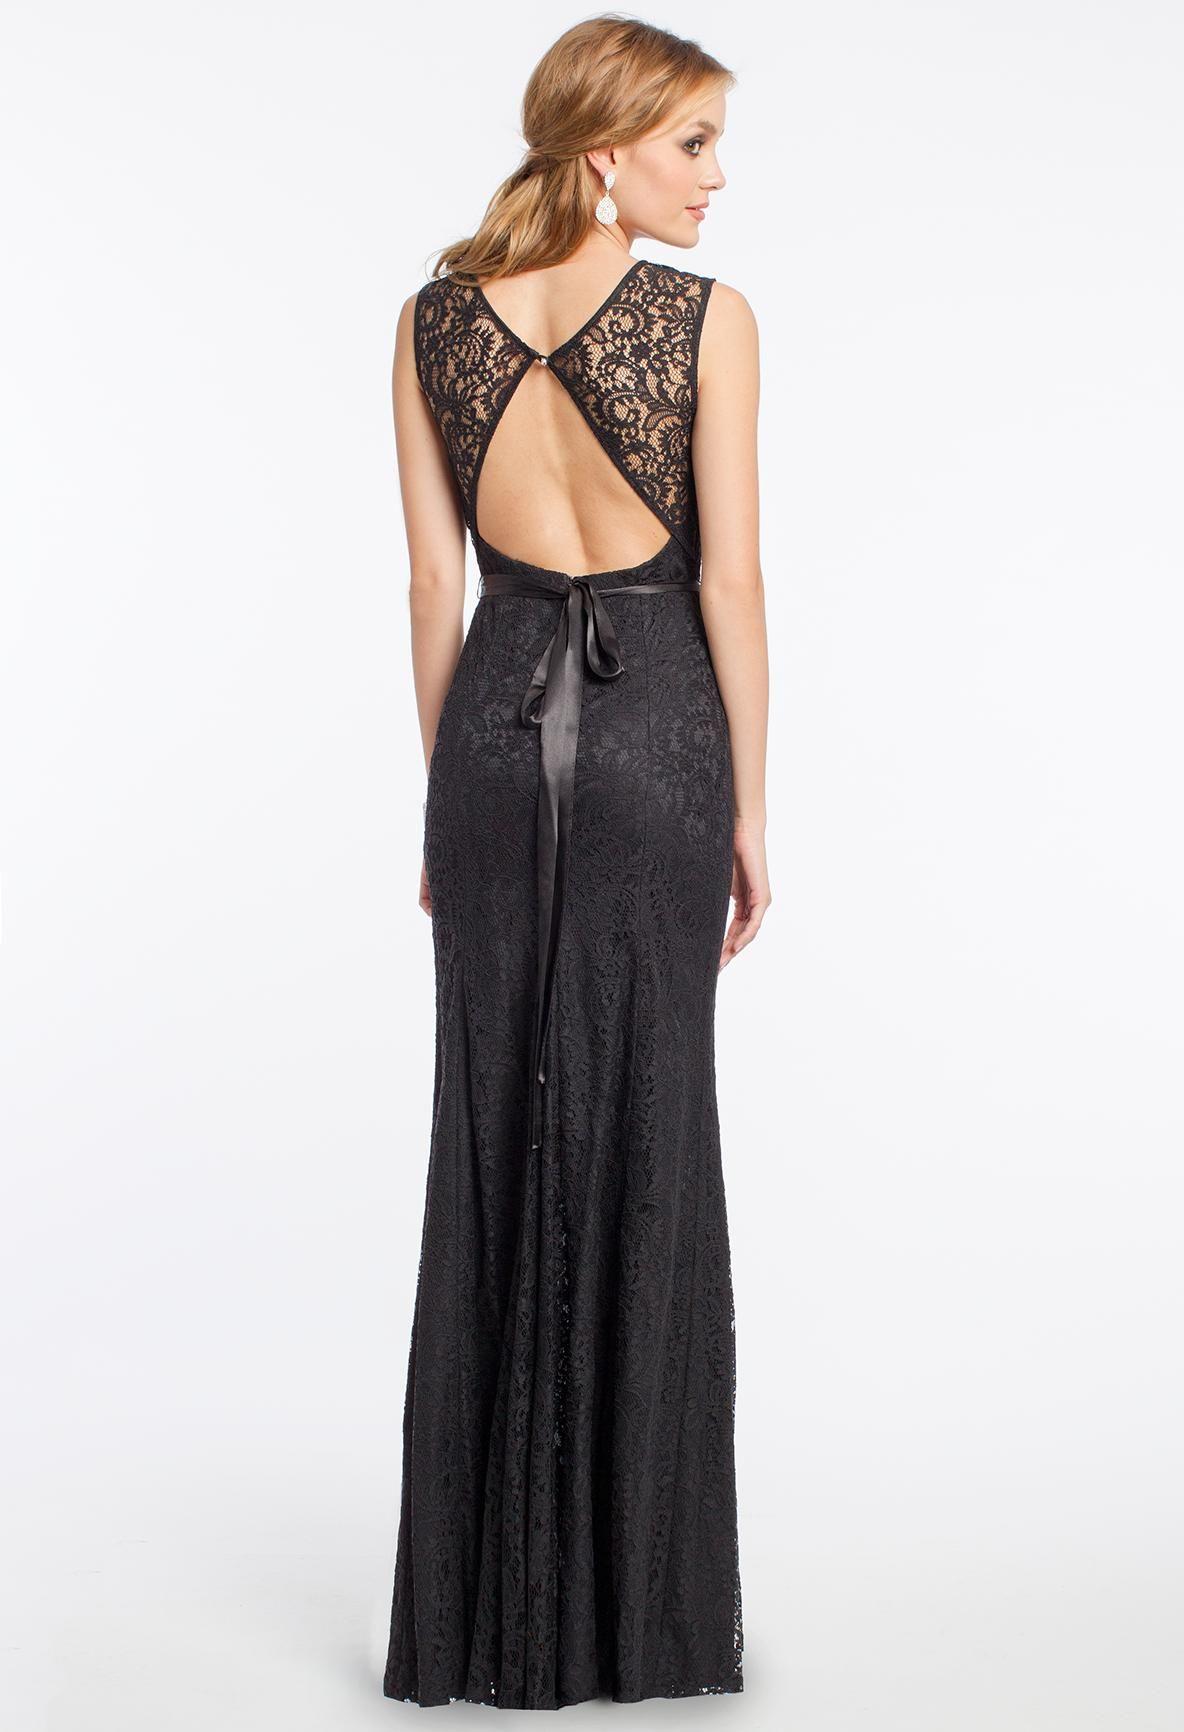 #camillelavie #blacklace #holidaydresses #openback #newarrivals